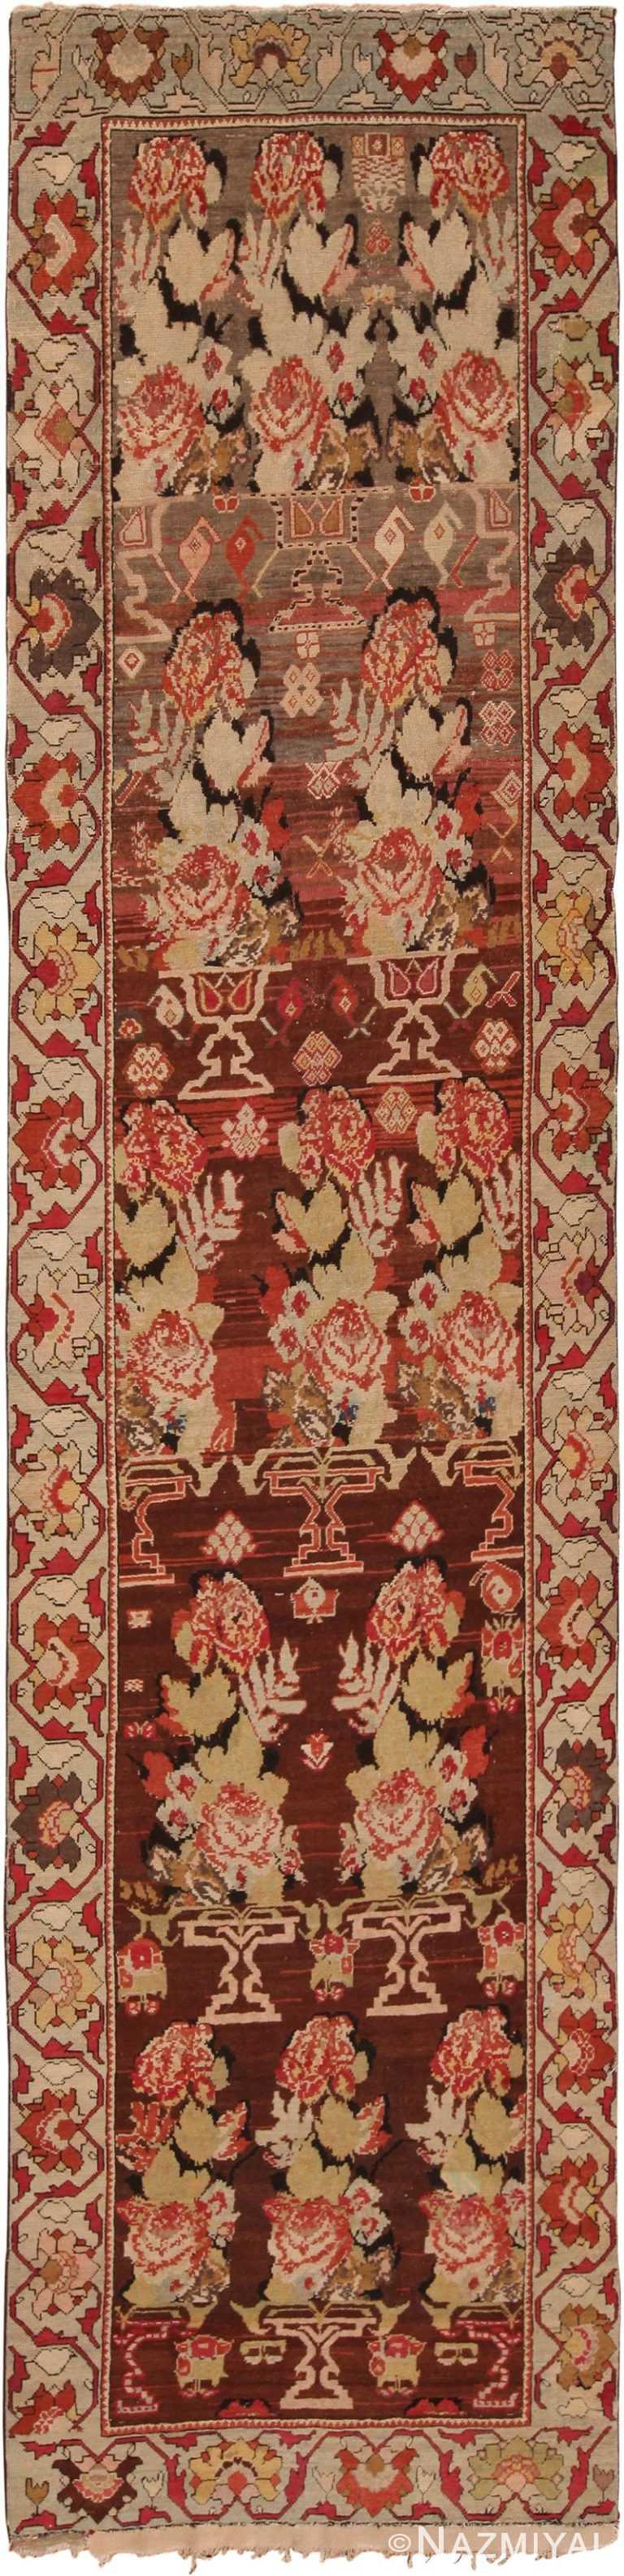 Antique Caucasian Karabagh Runner Rug 70423 by Nazmiyal NYC